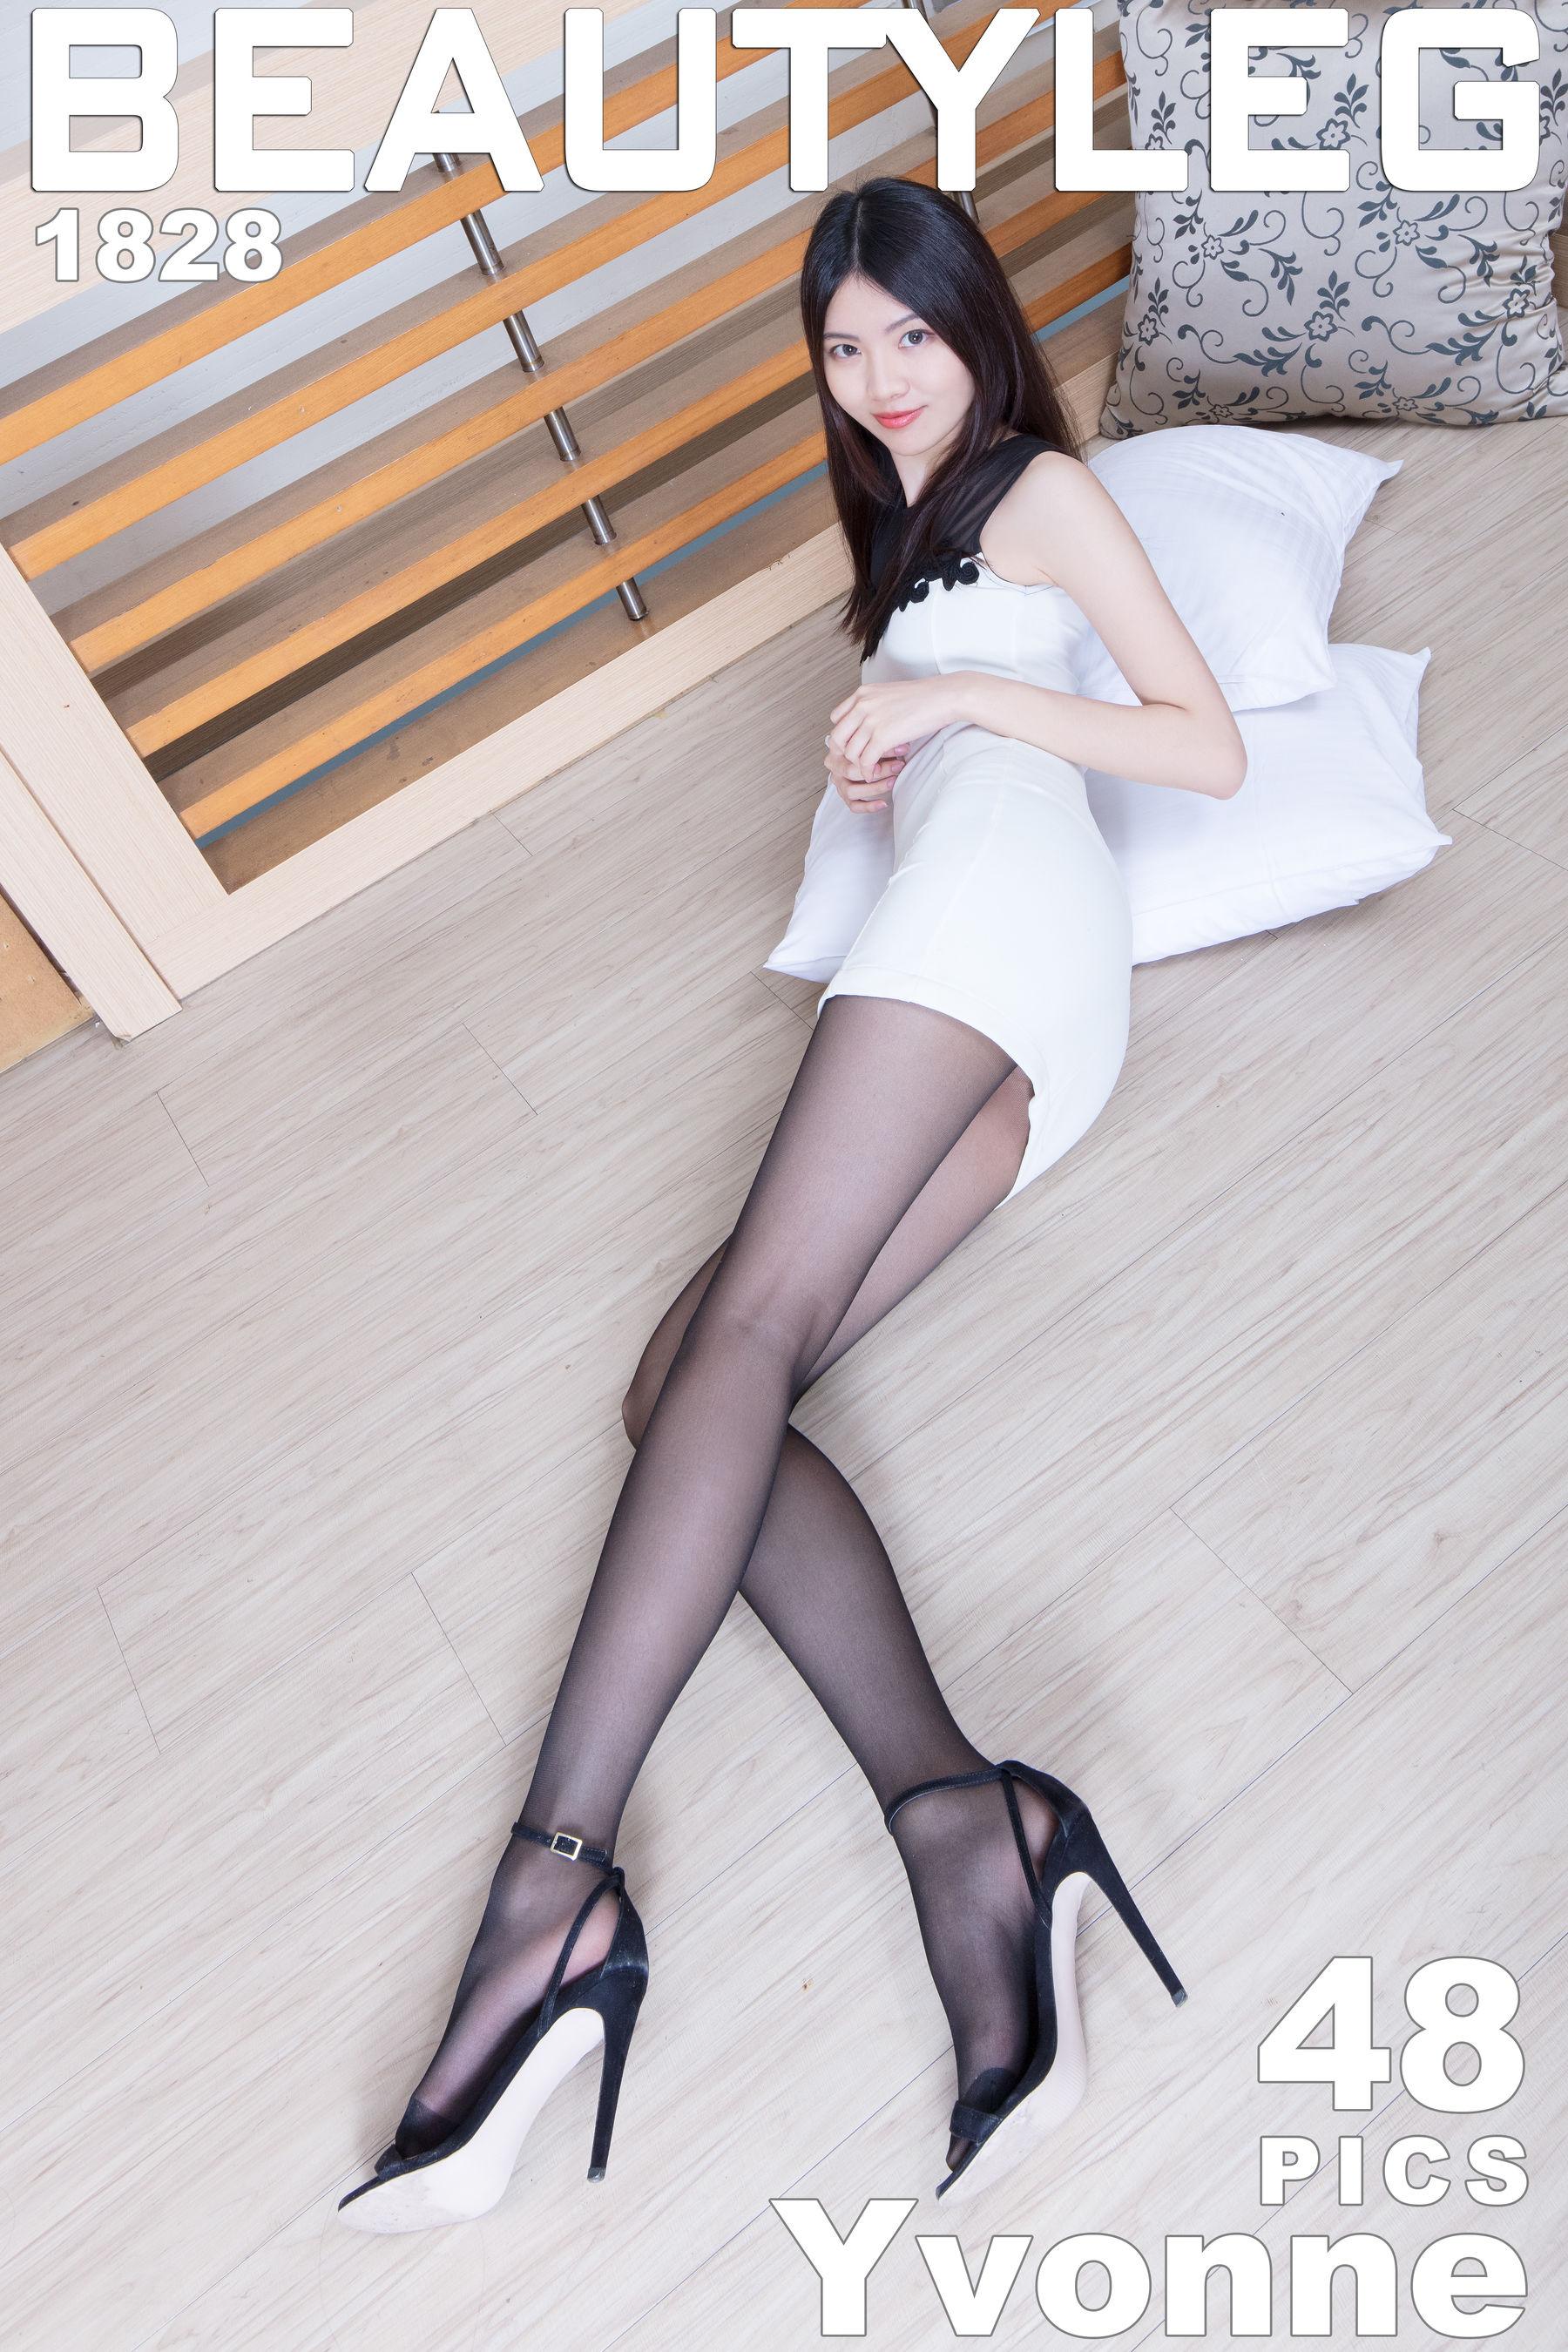 VOL.38 [Beautyleg]丝袜美腿长腿美女:梁以辰(钟幸村)超高清个人性感漂亮大图(48P)